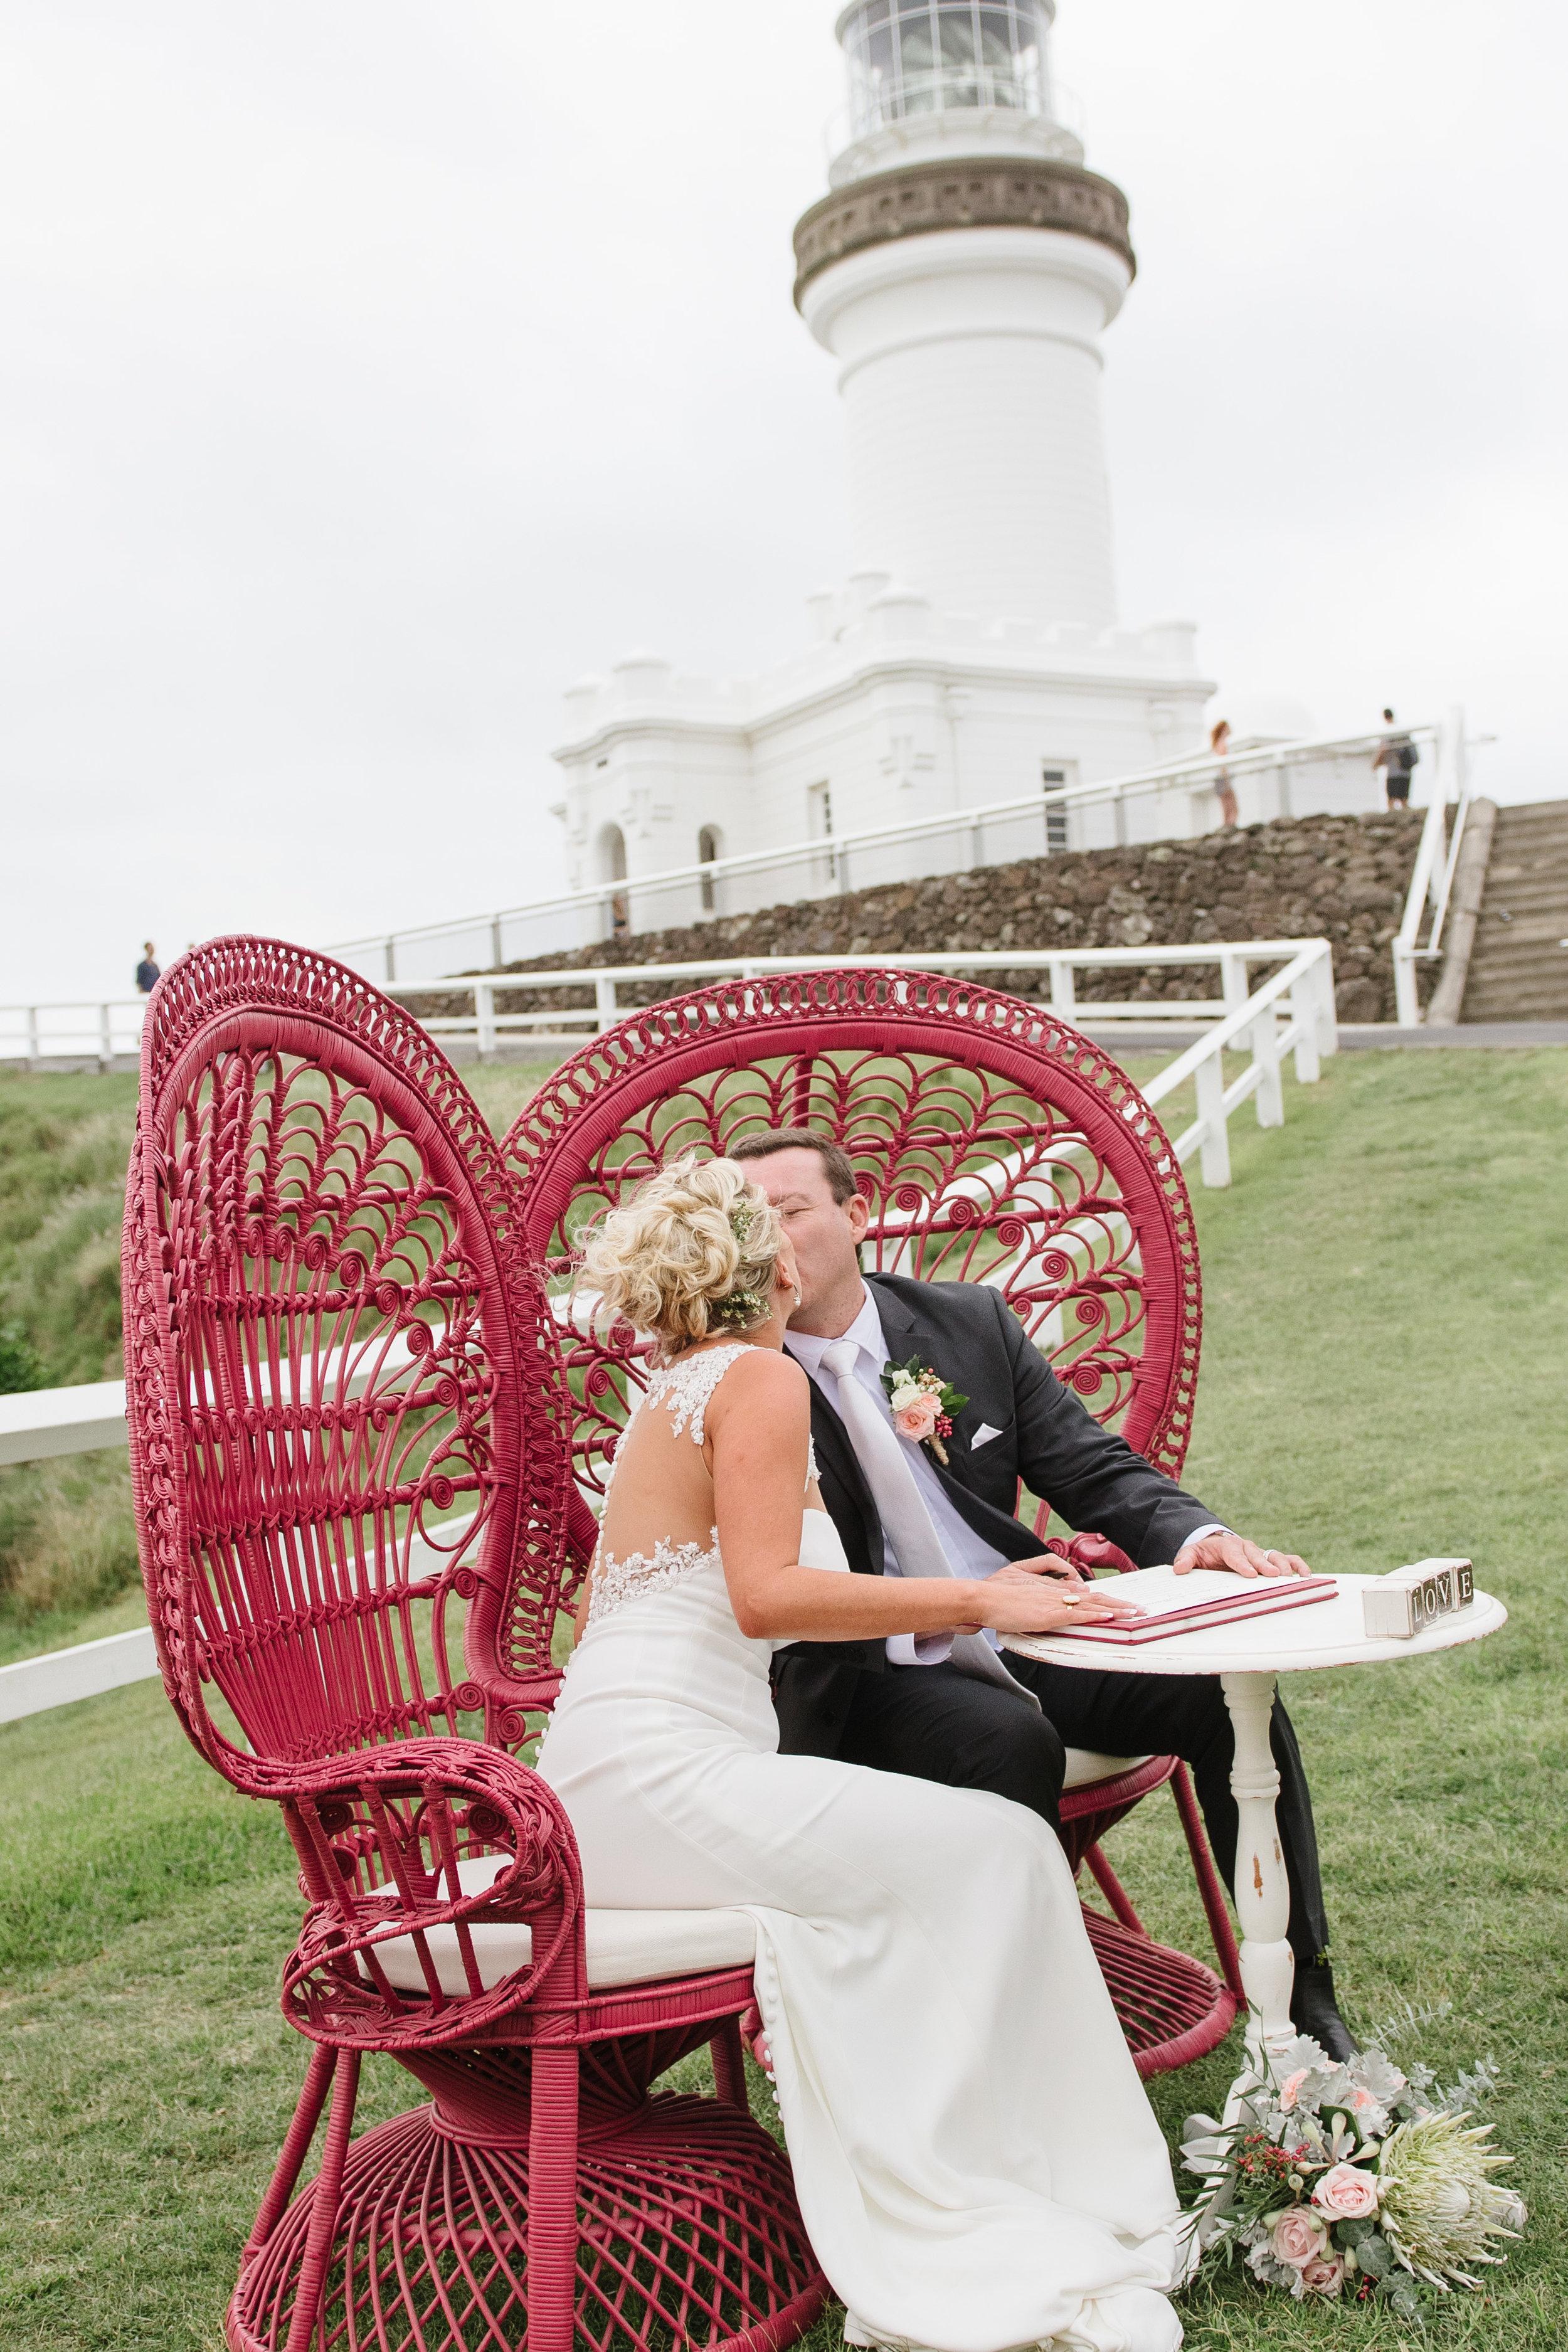 Katie and Matt- wedding photographer, byron bay wedding and family photographer, tweed heads wedding and family photography-330.jpg